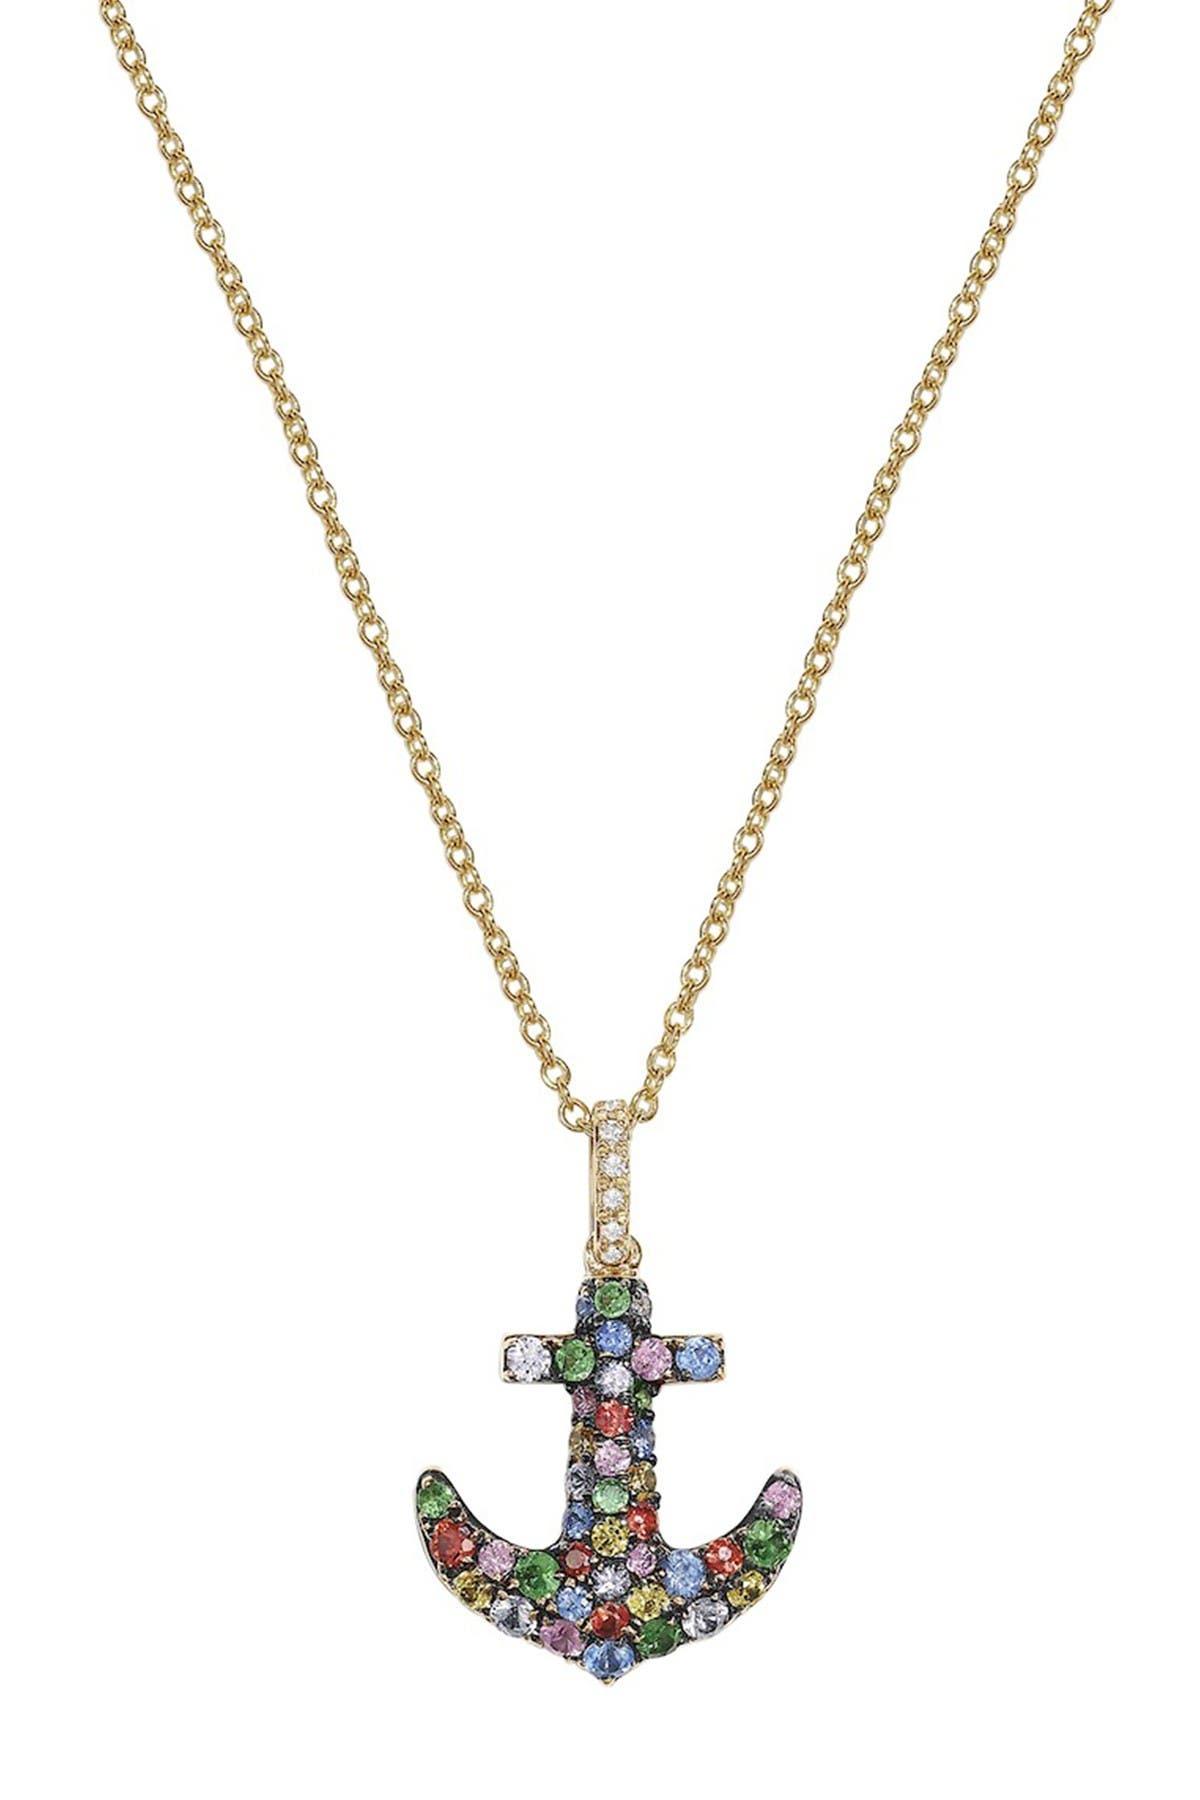 Image of Effy 14K Yellow Gold Diamond & Sapphire Anchor Pendant Necklace - 0.02 ctw